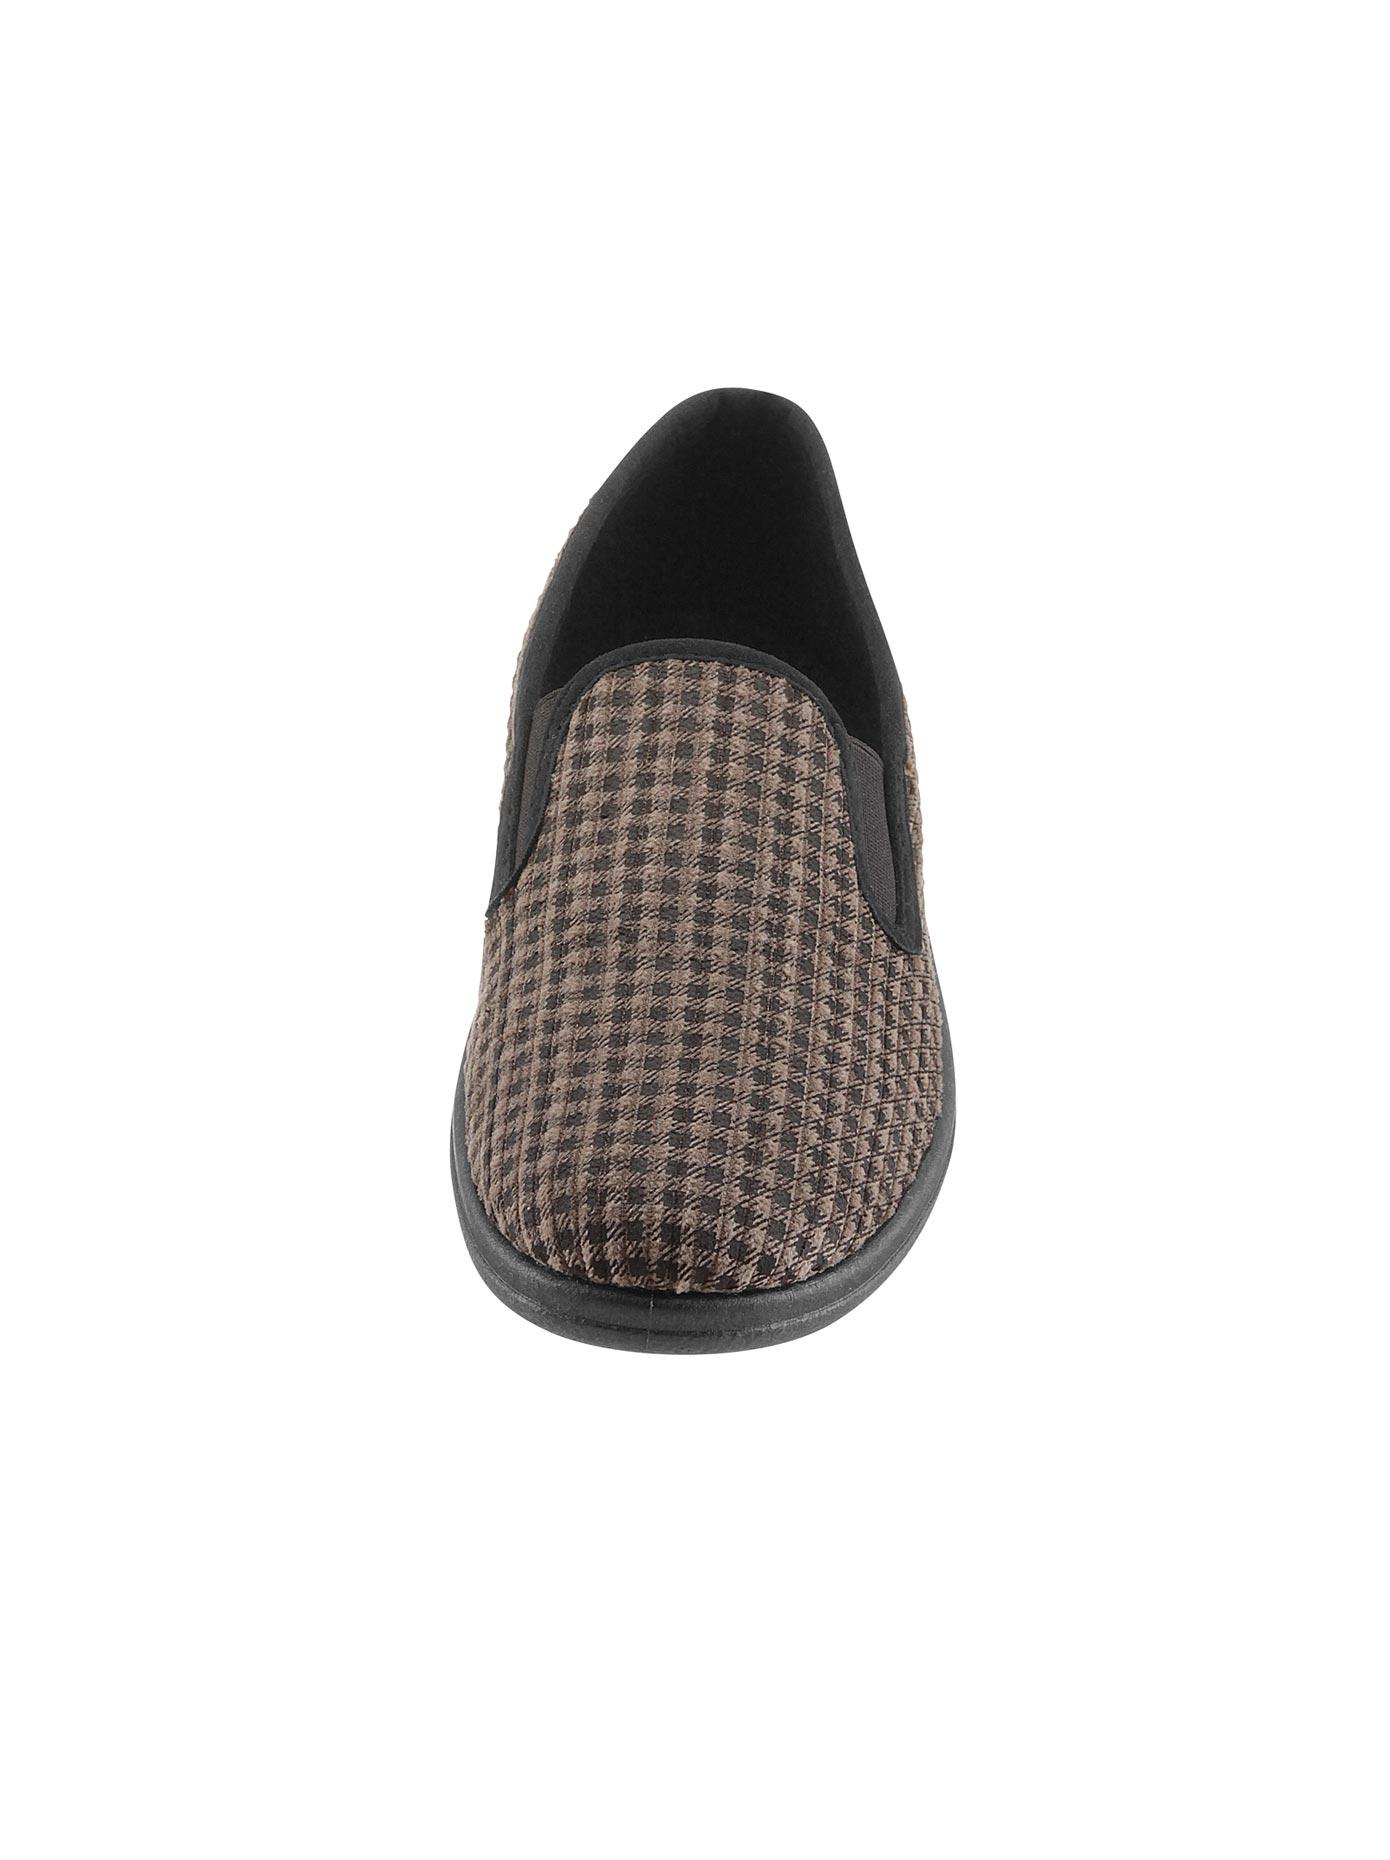 PANTO FINO Hausschuh mit anatomisch geformtem Fußbett | Schuhe > Hausschuhe > Klassische Hausschuhe | Schwarz | Pvc | Panto Fino